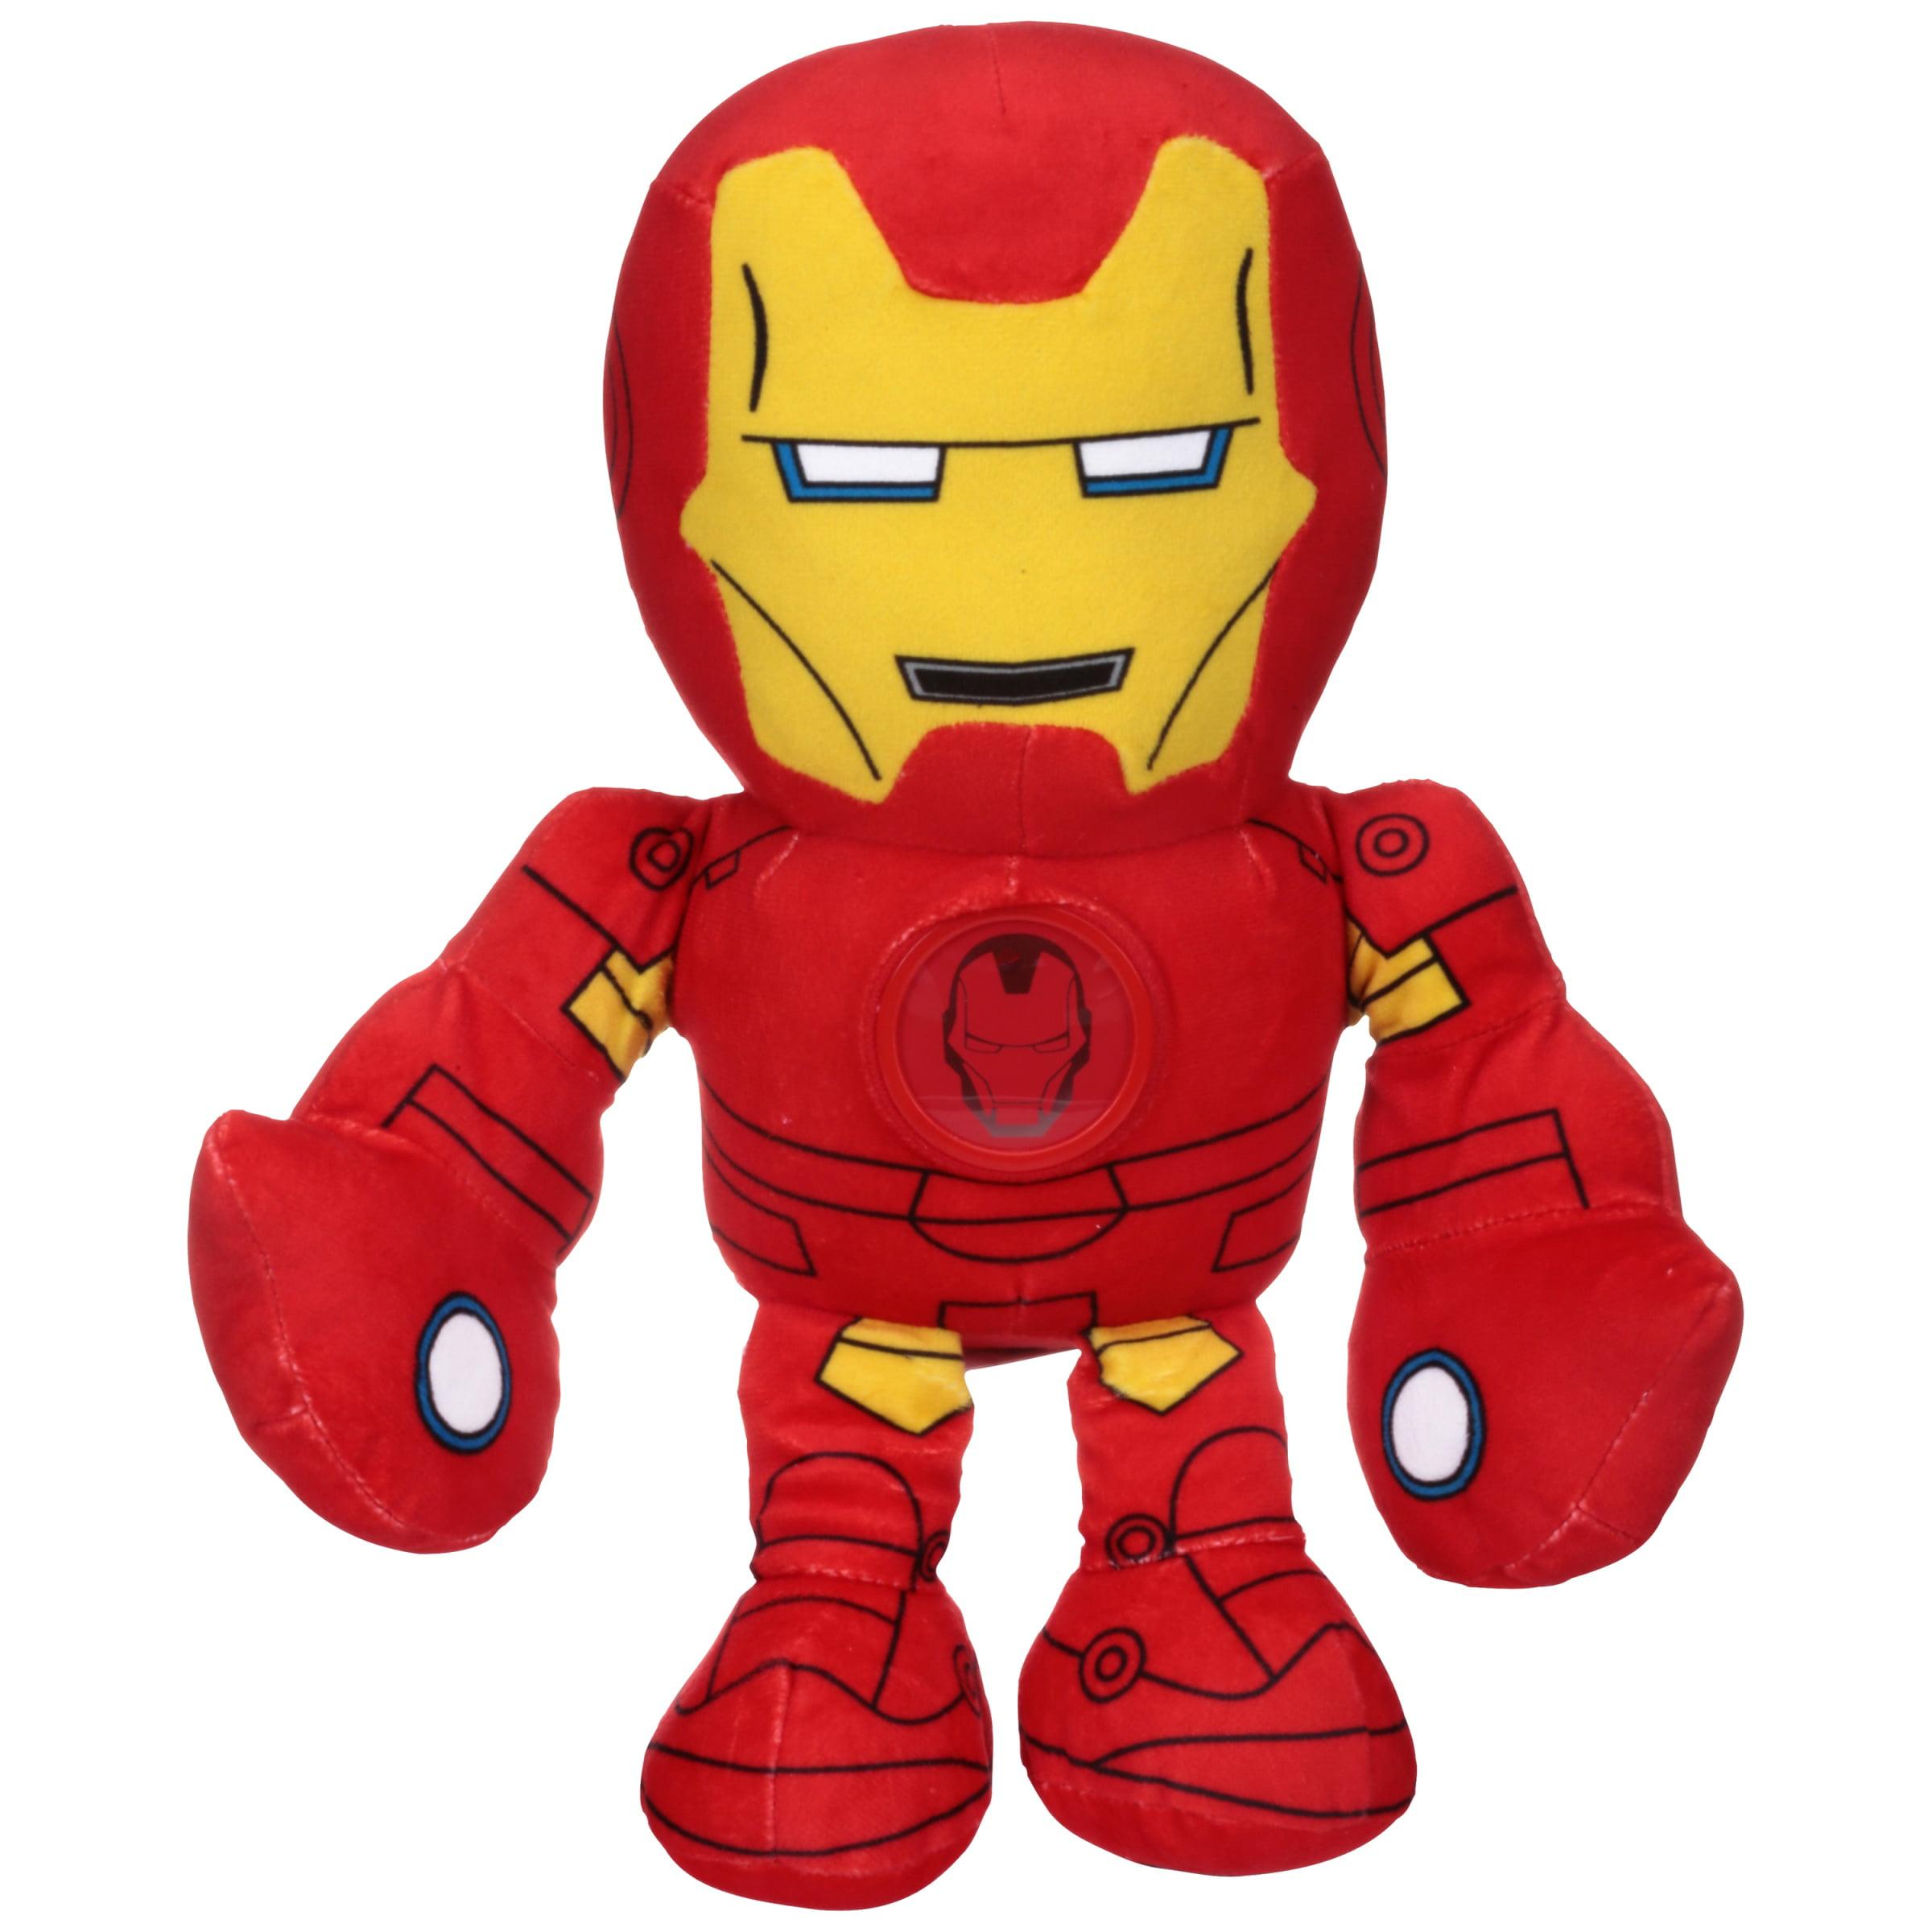 Marvel Super Hero Adventures Iron Man Bedtime Buddies Toy